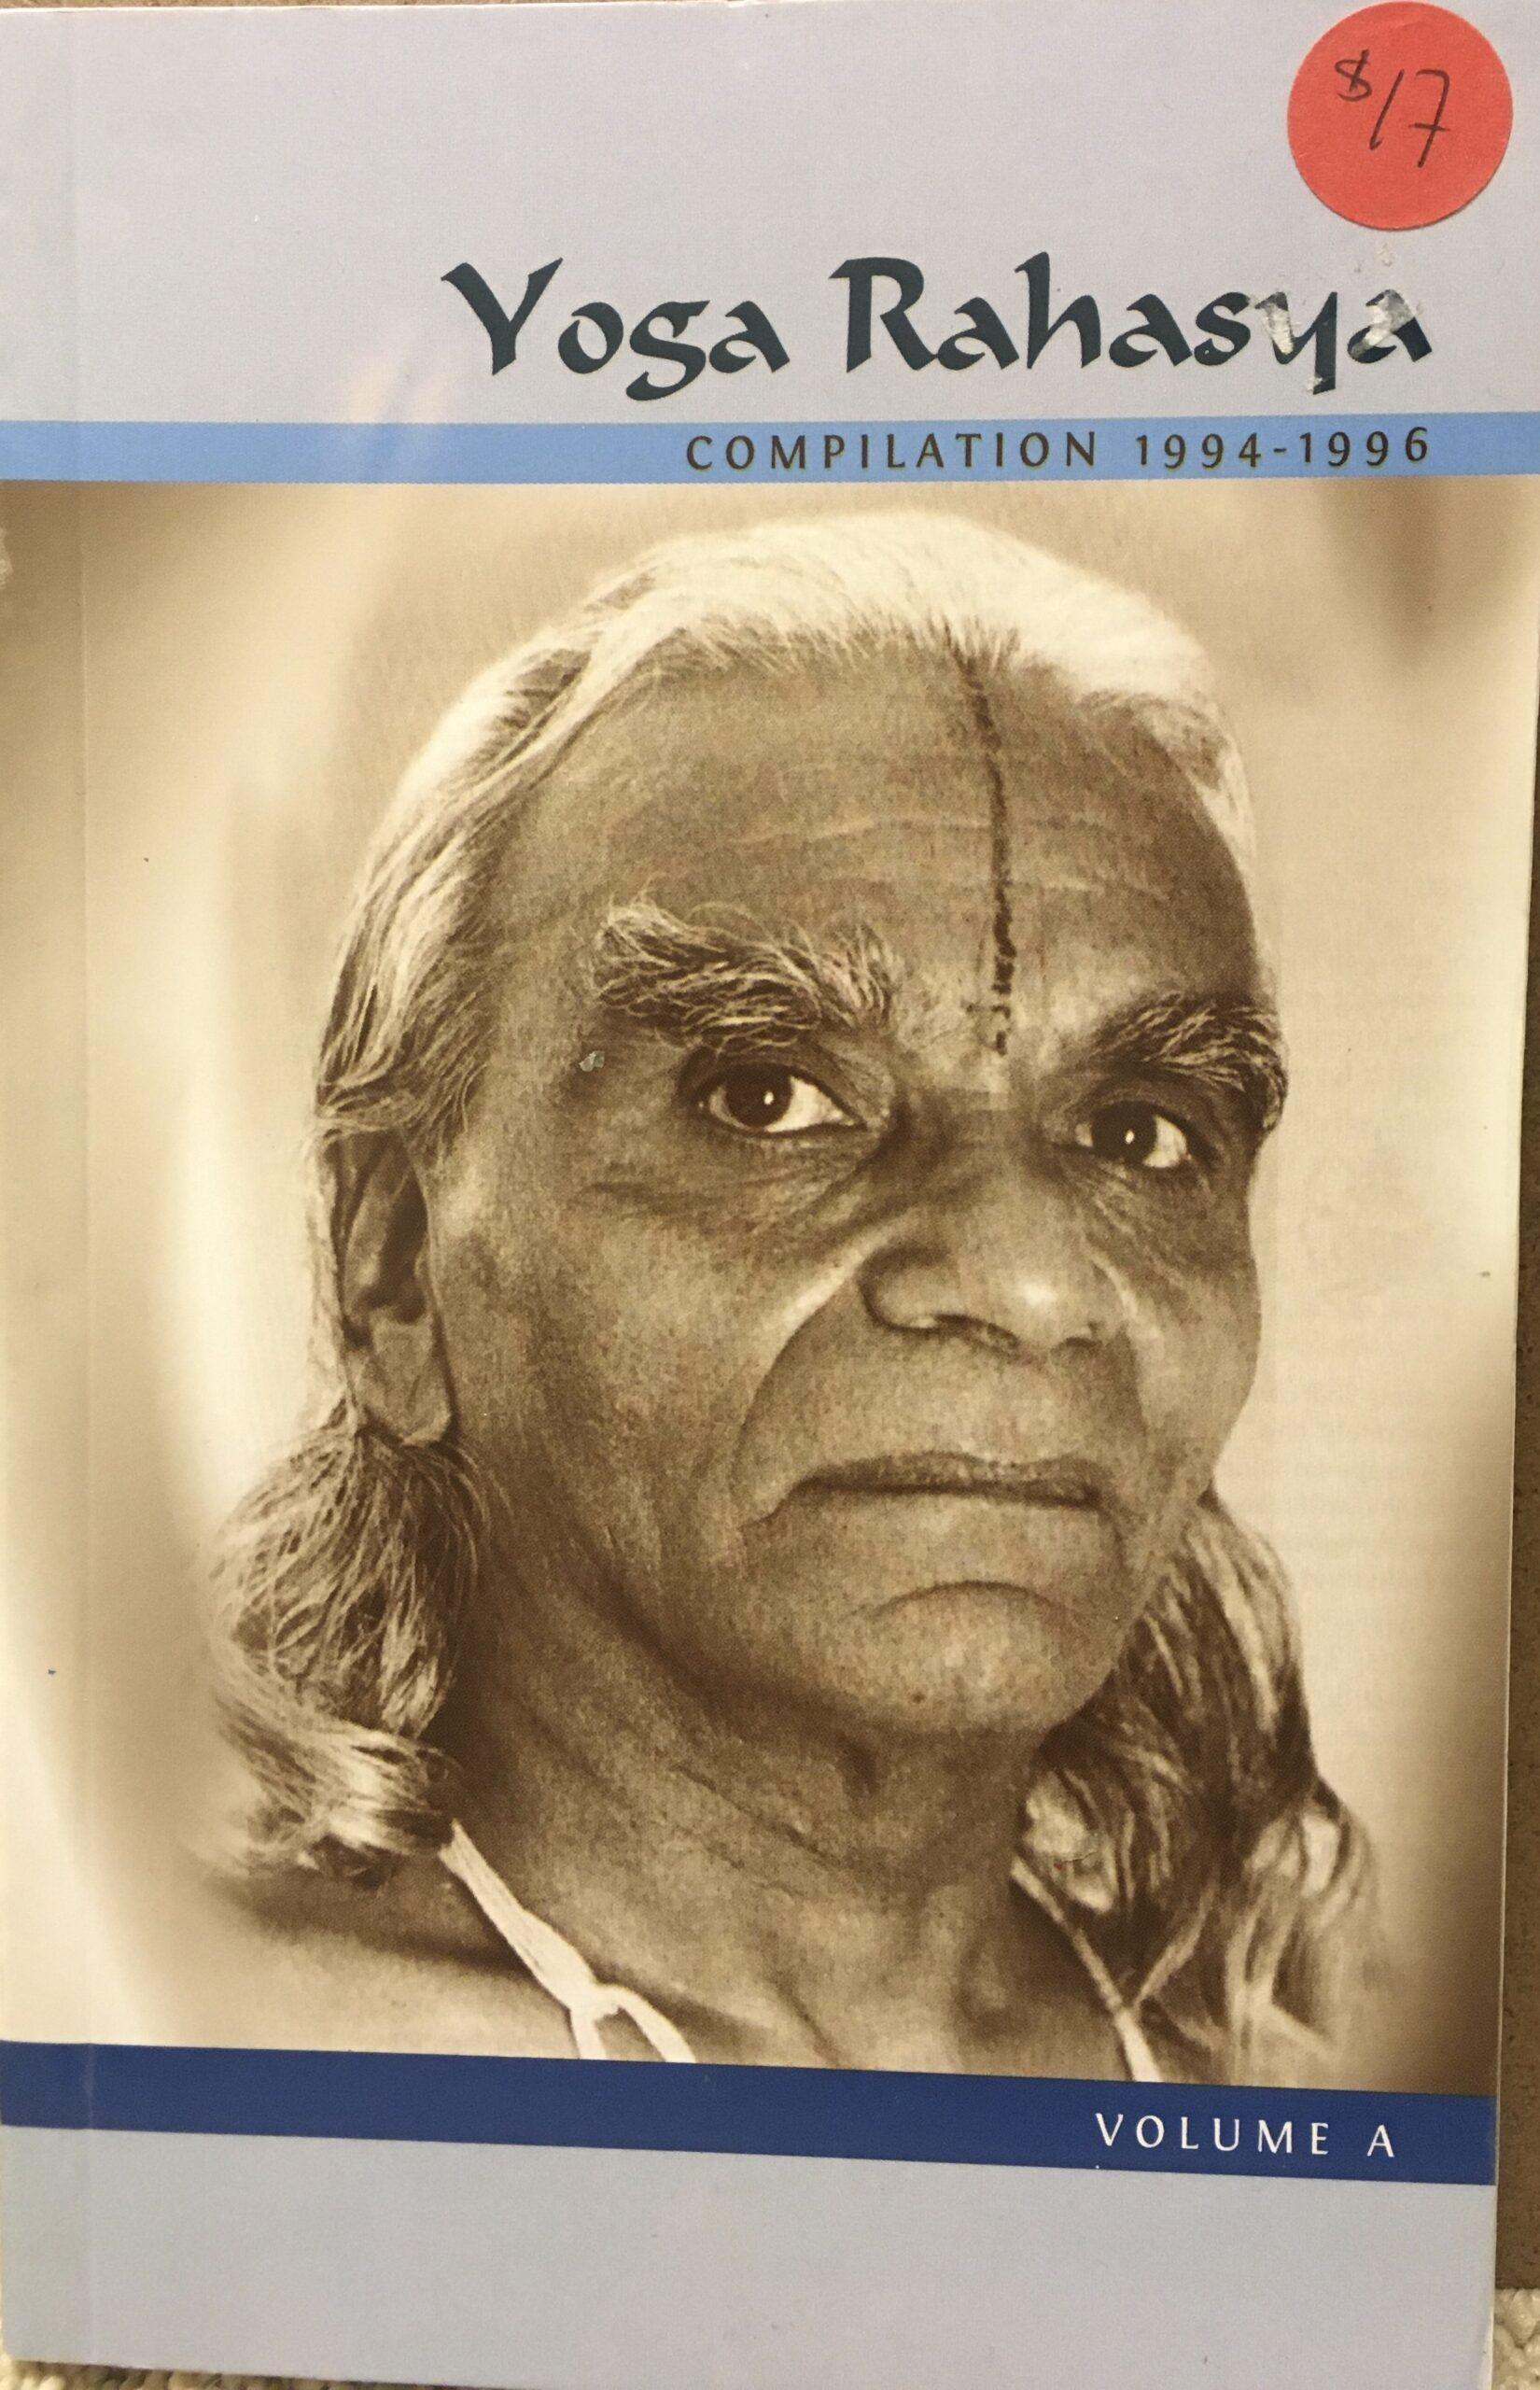 Yoga Rahasya A-Compilation 1994-1996